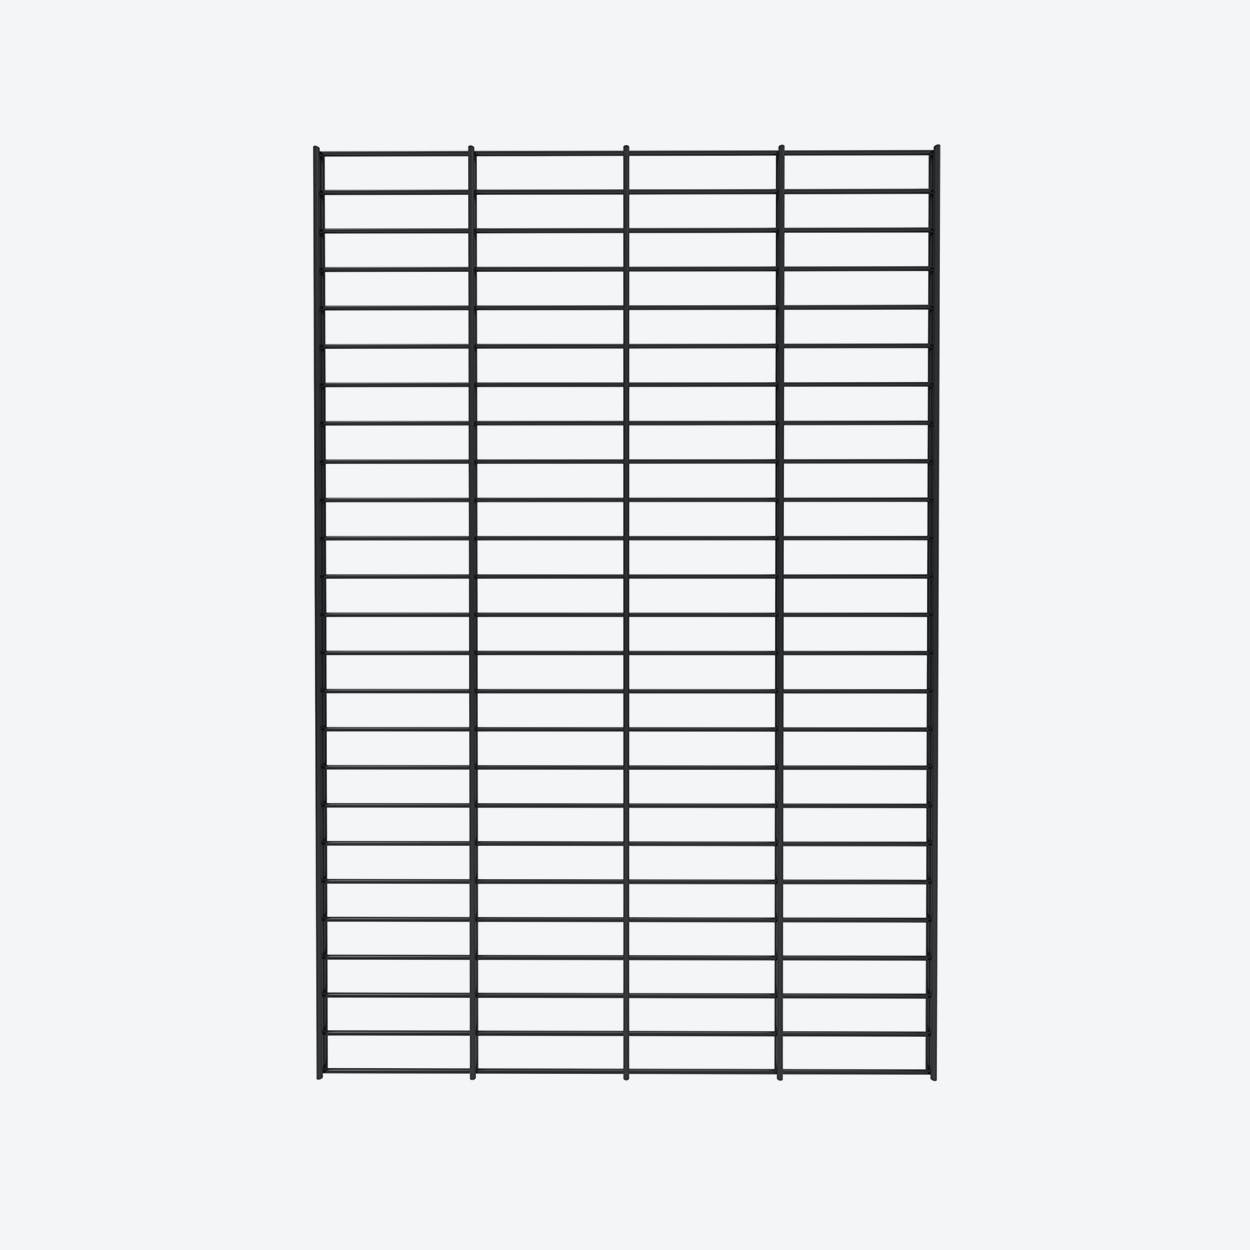 FencyRack, 80x120 in Black